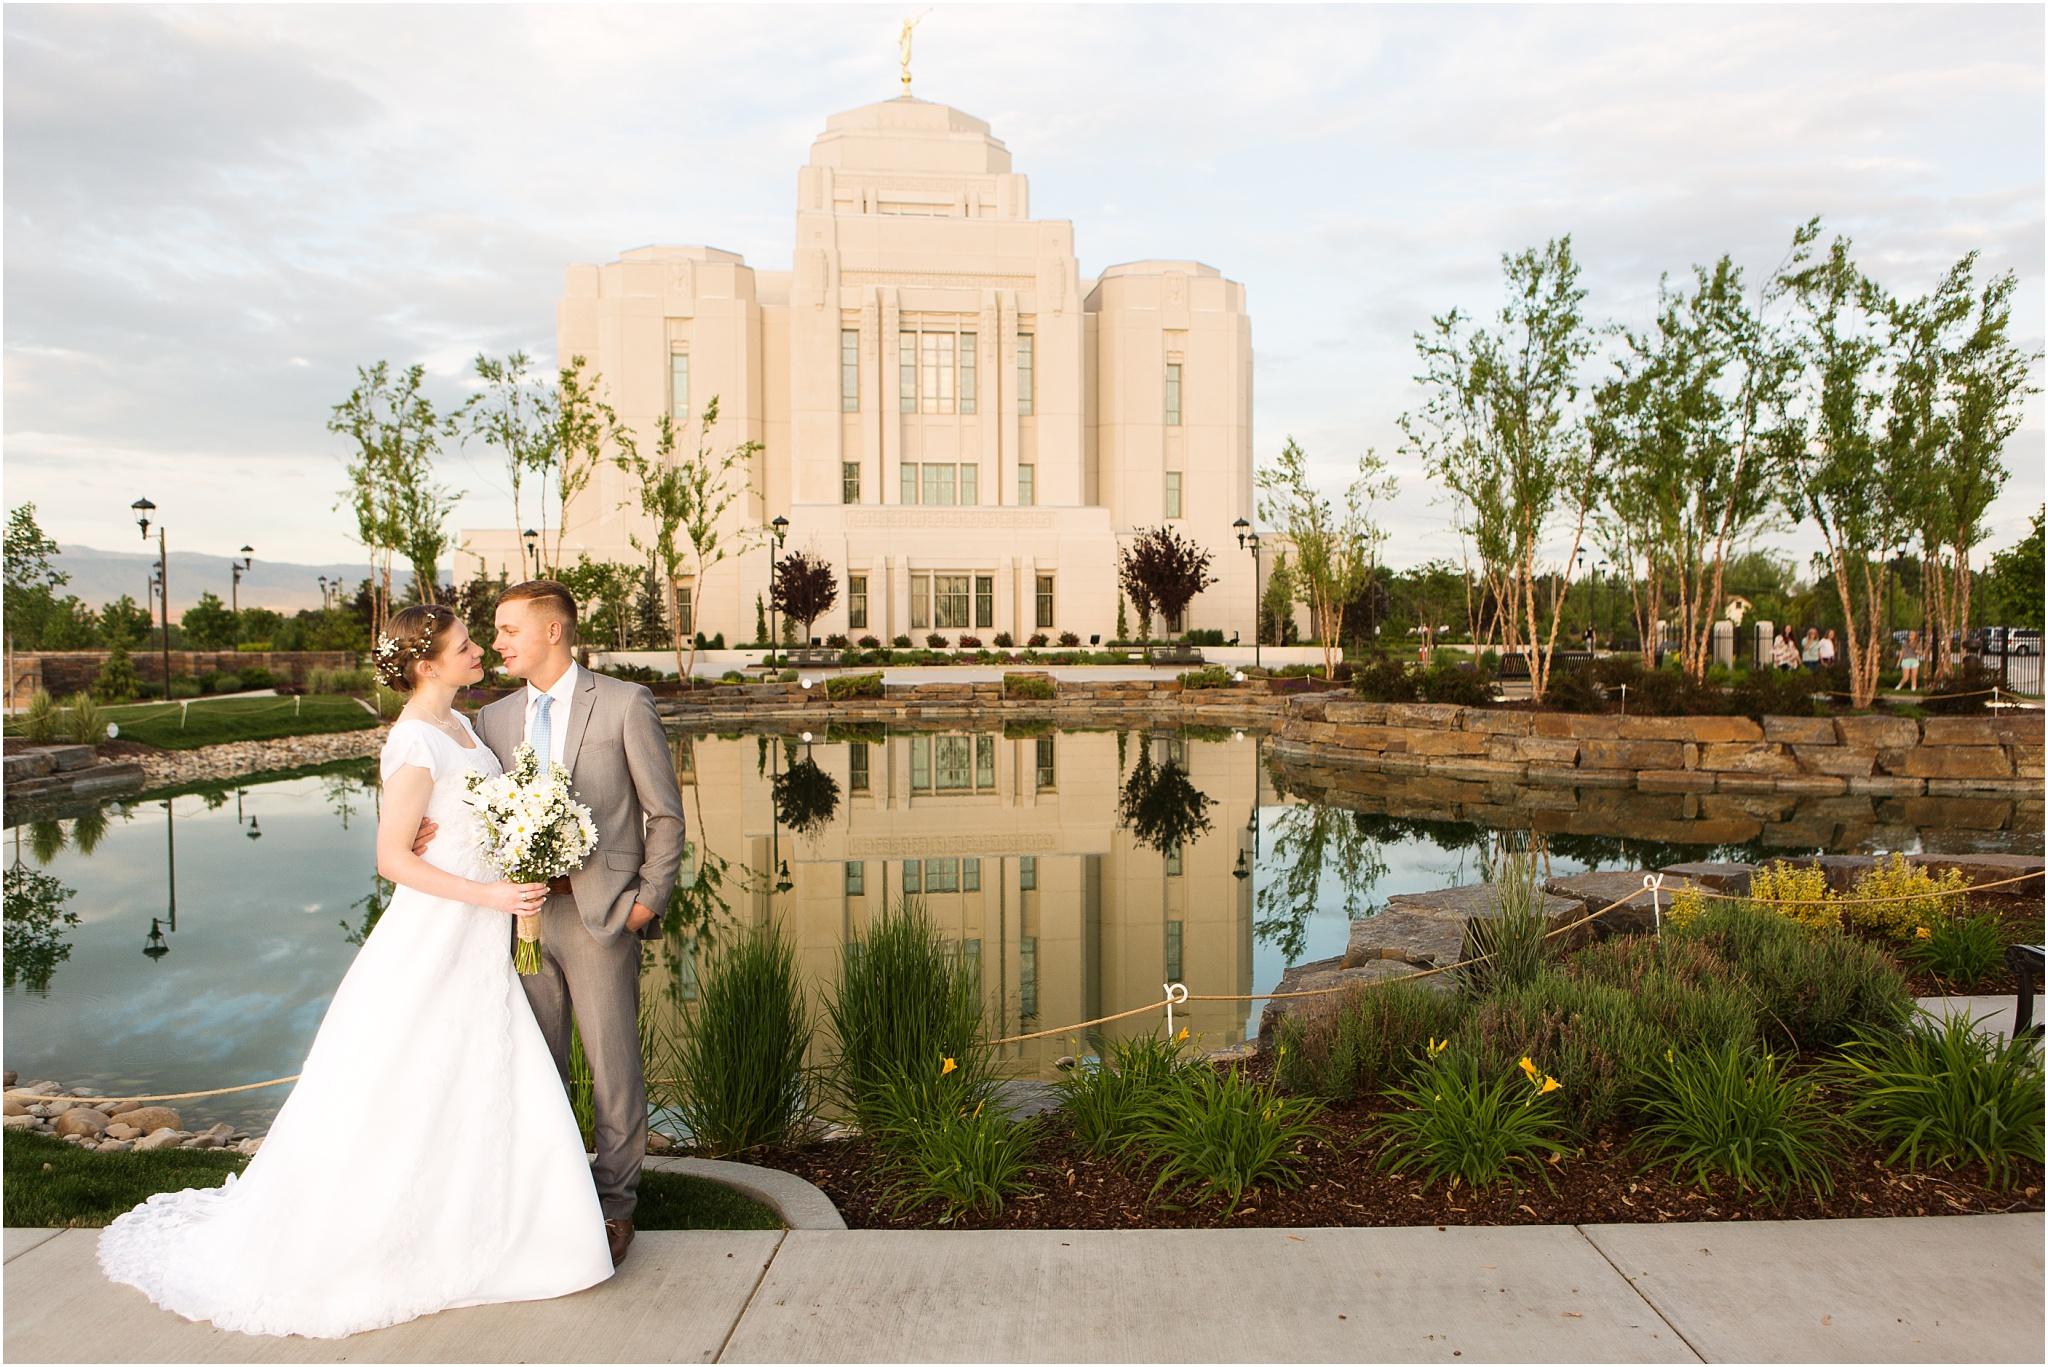 Wedding Photography_Meridian Idaho Temple_Boise Idaho_Leah Southwick Photography_0030.jpg